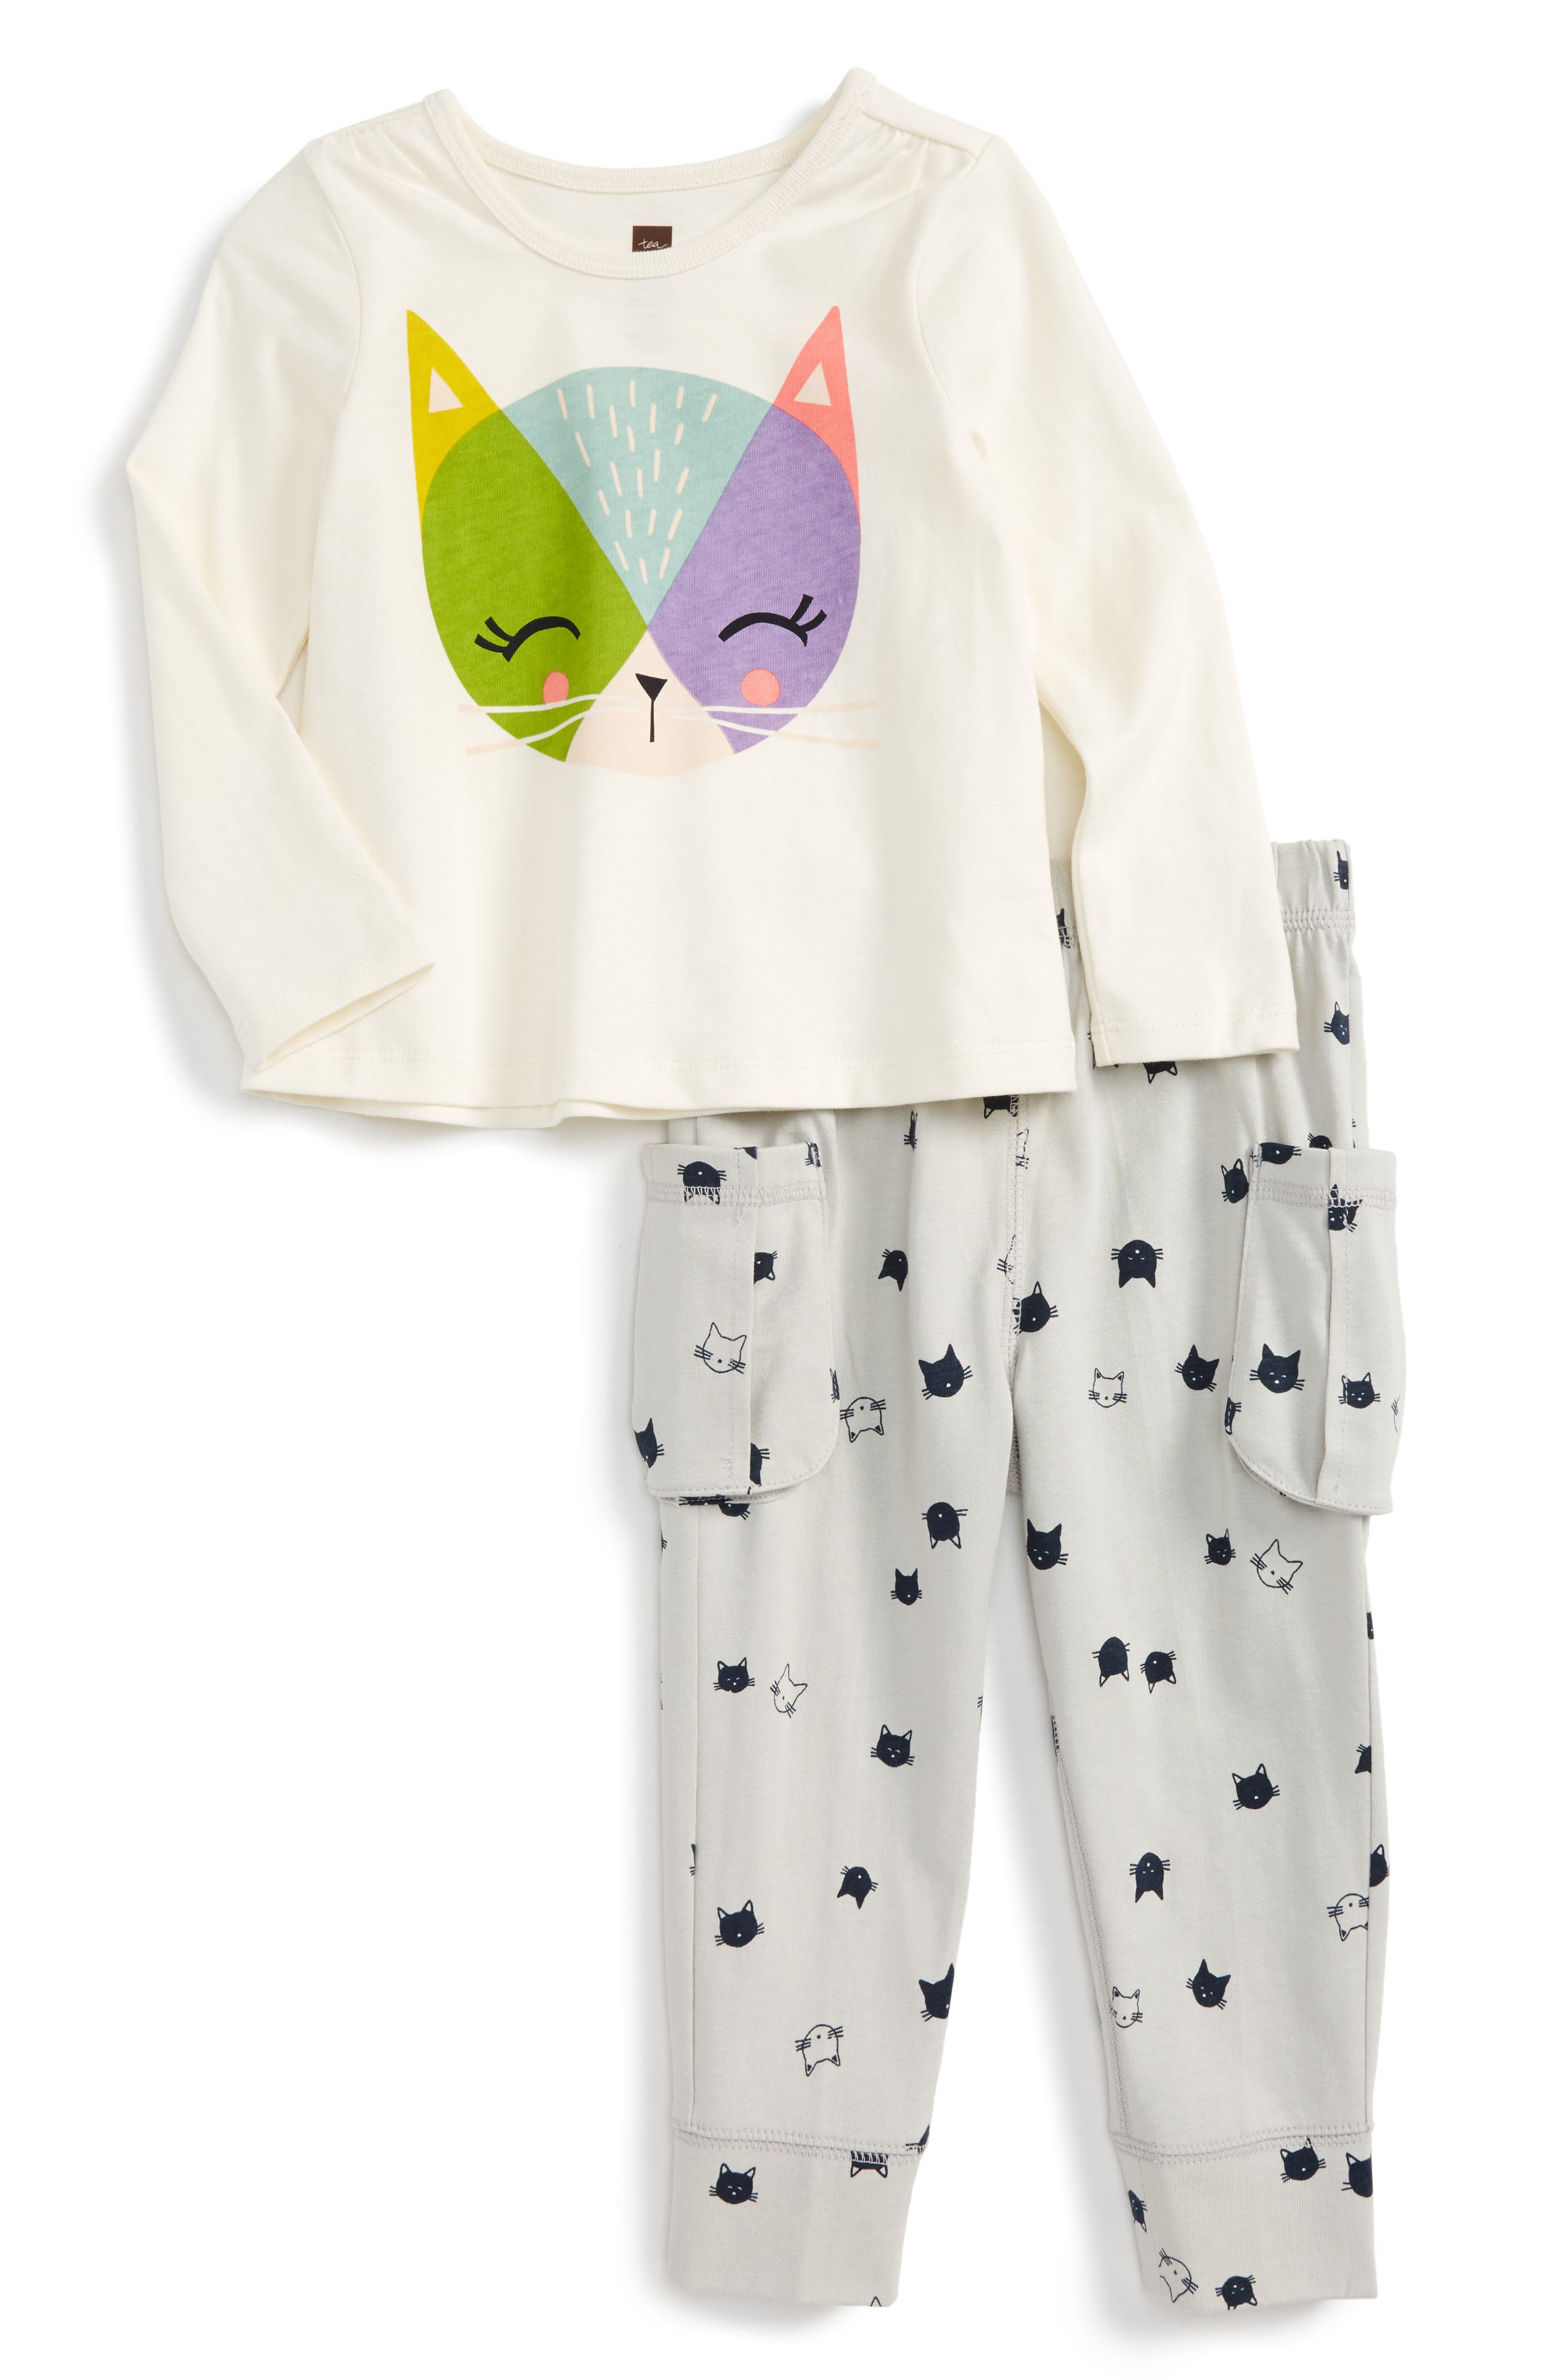 Tea Collection Hamish McHamish Graphic Top & Sweatpants (Baby Girls)